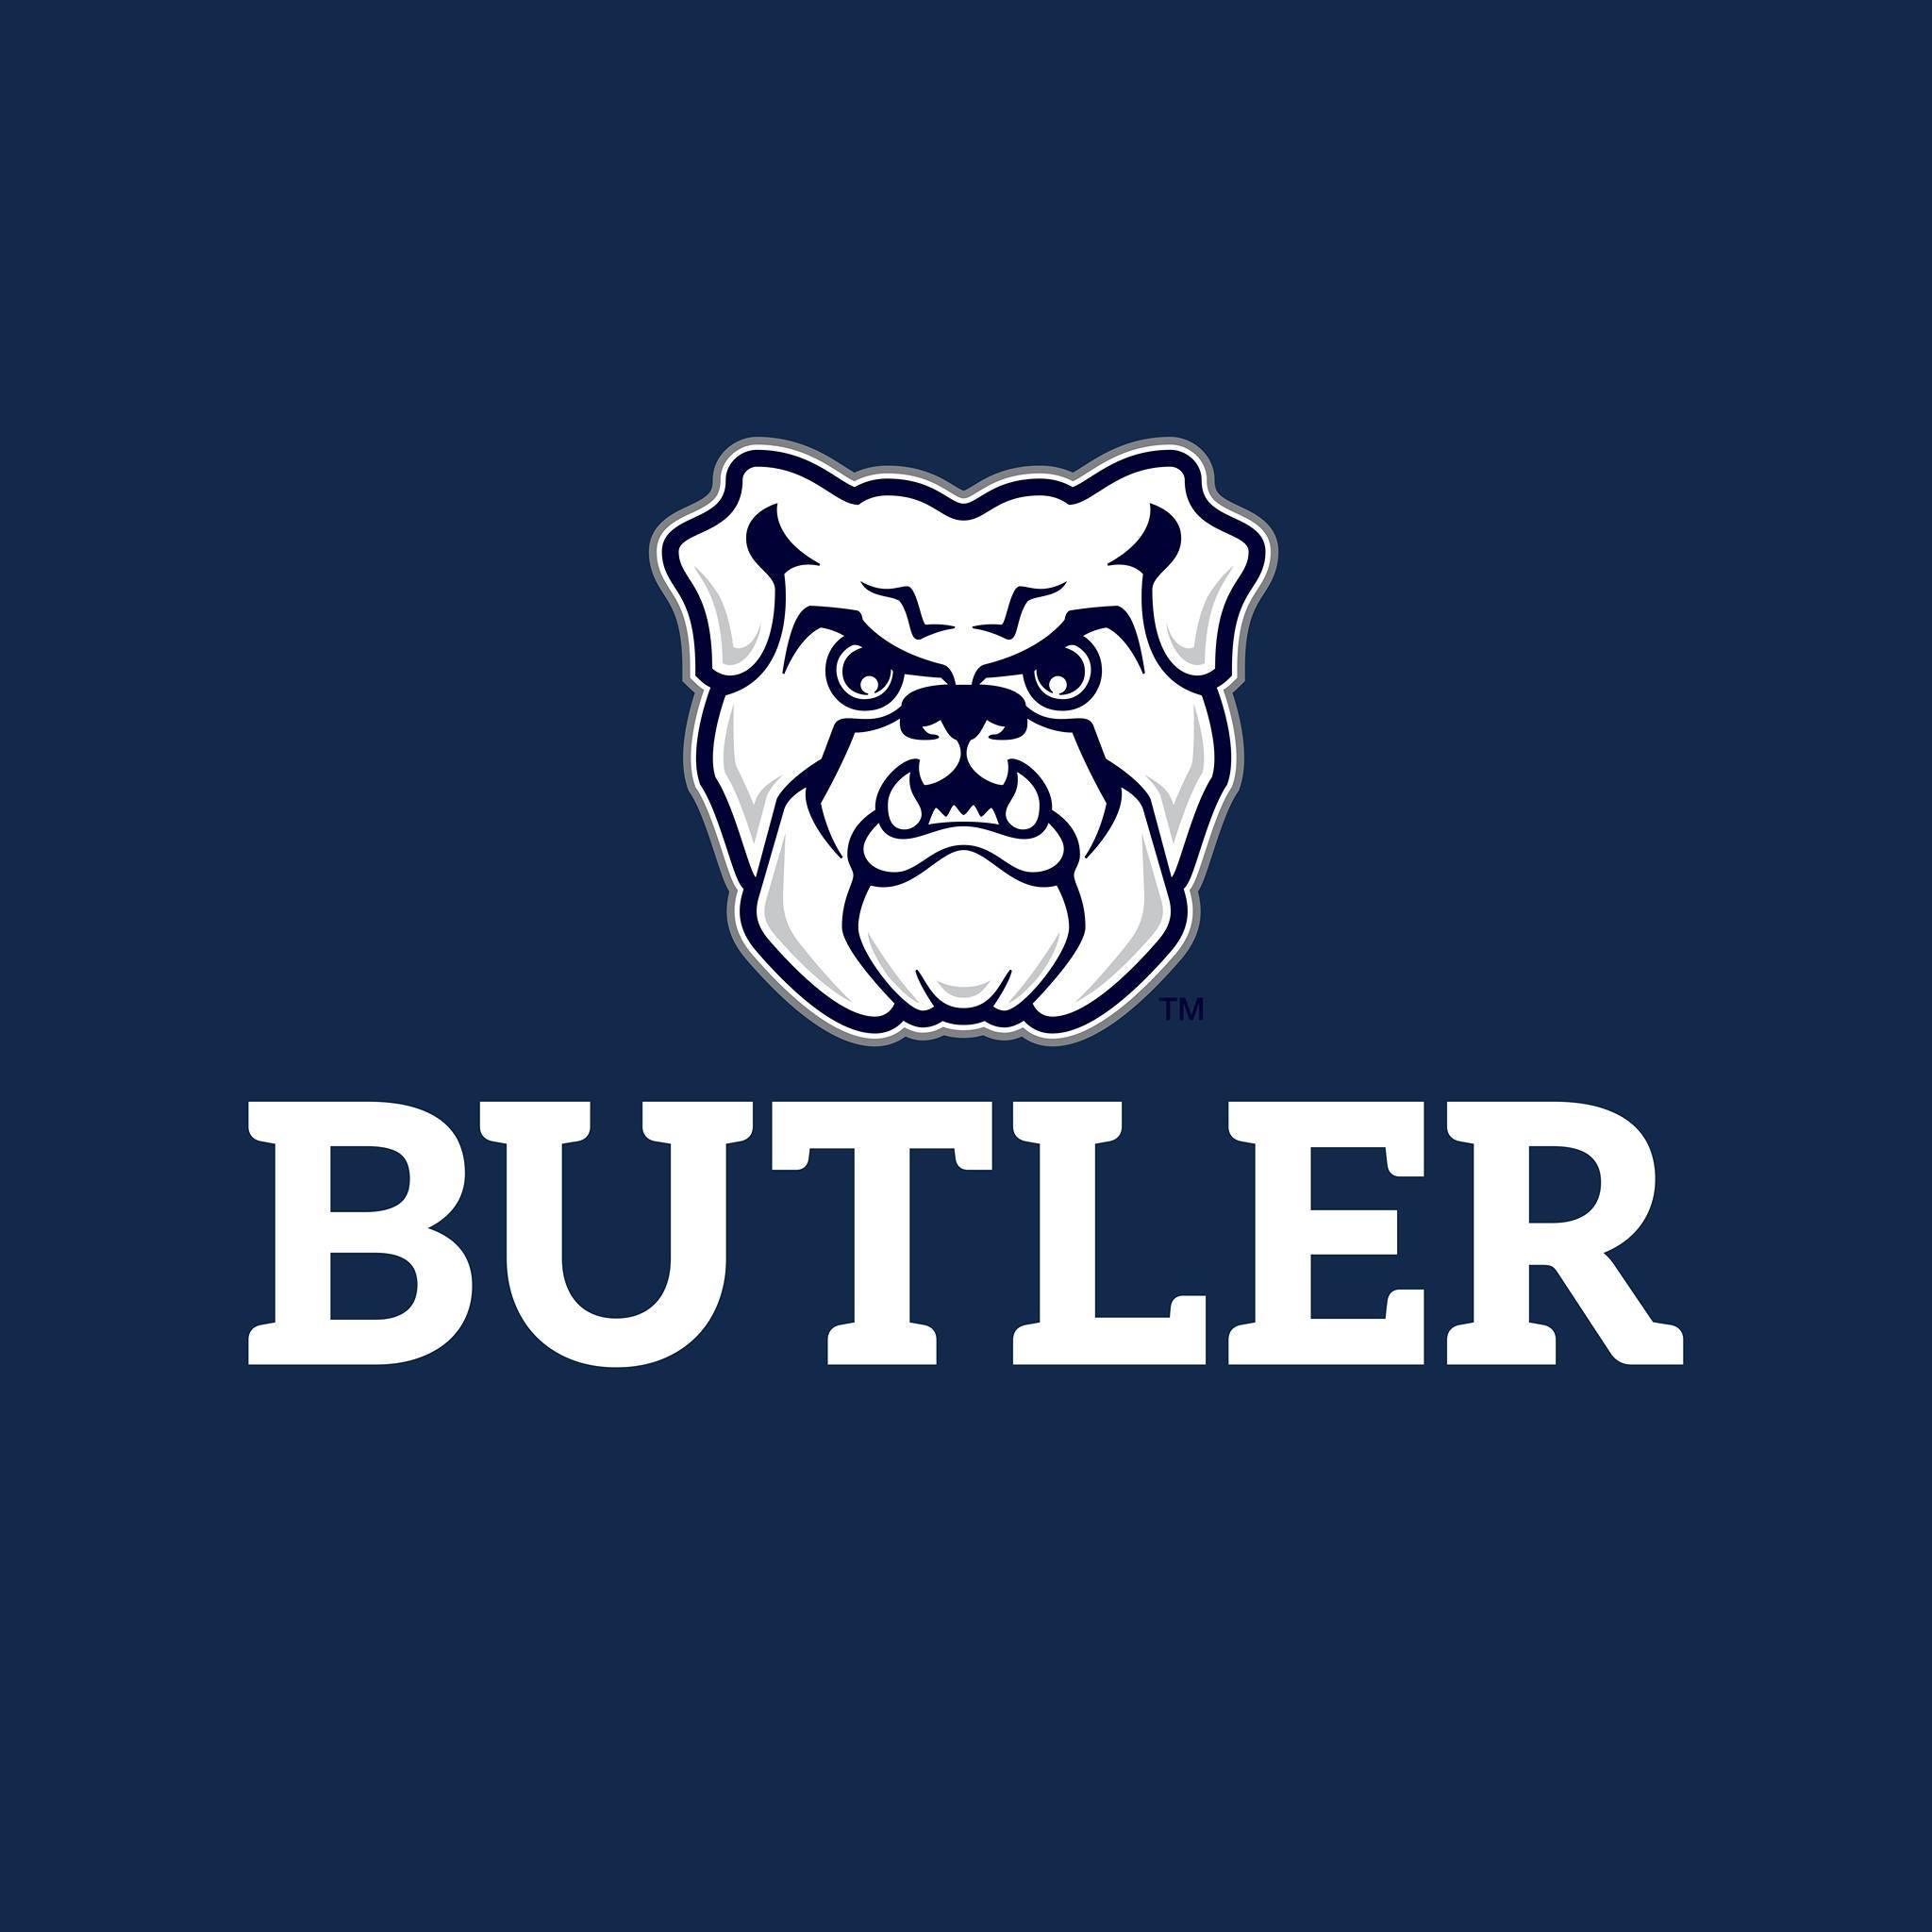 Butler University Hurling Club